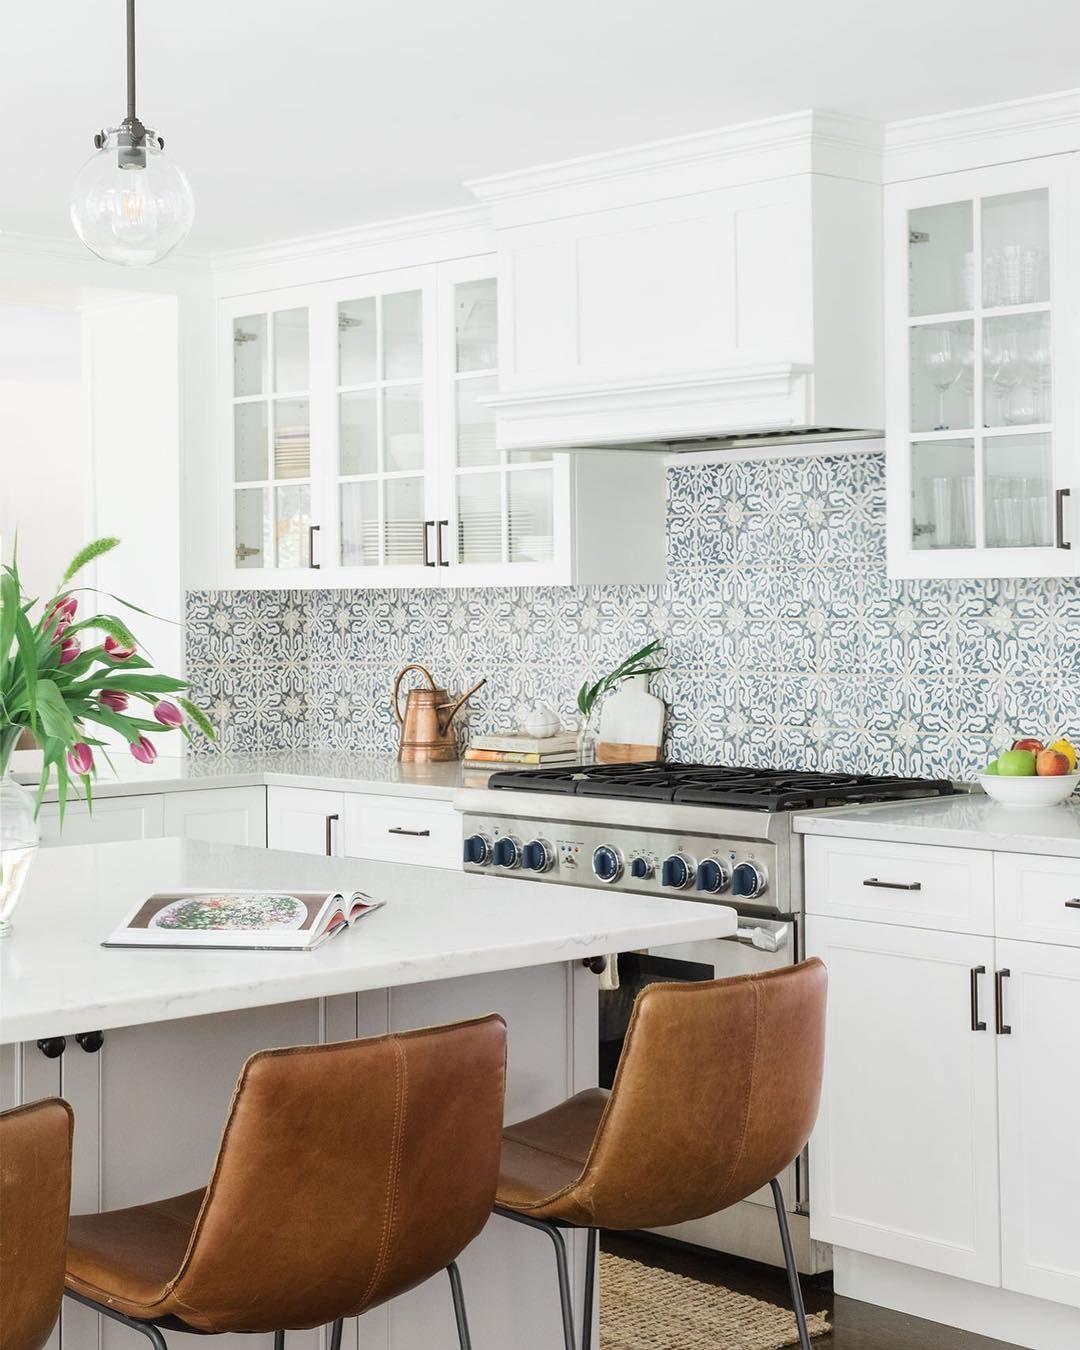 Blue and white pattern tile backsplash in kitchen   Interiors ...